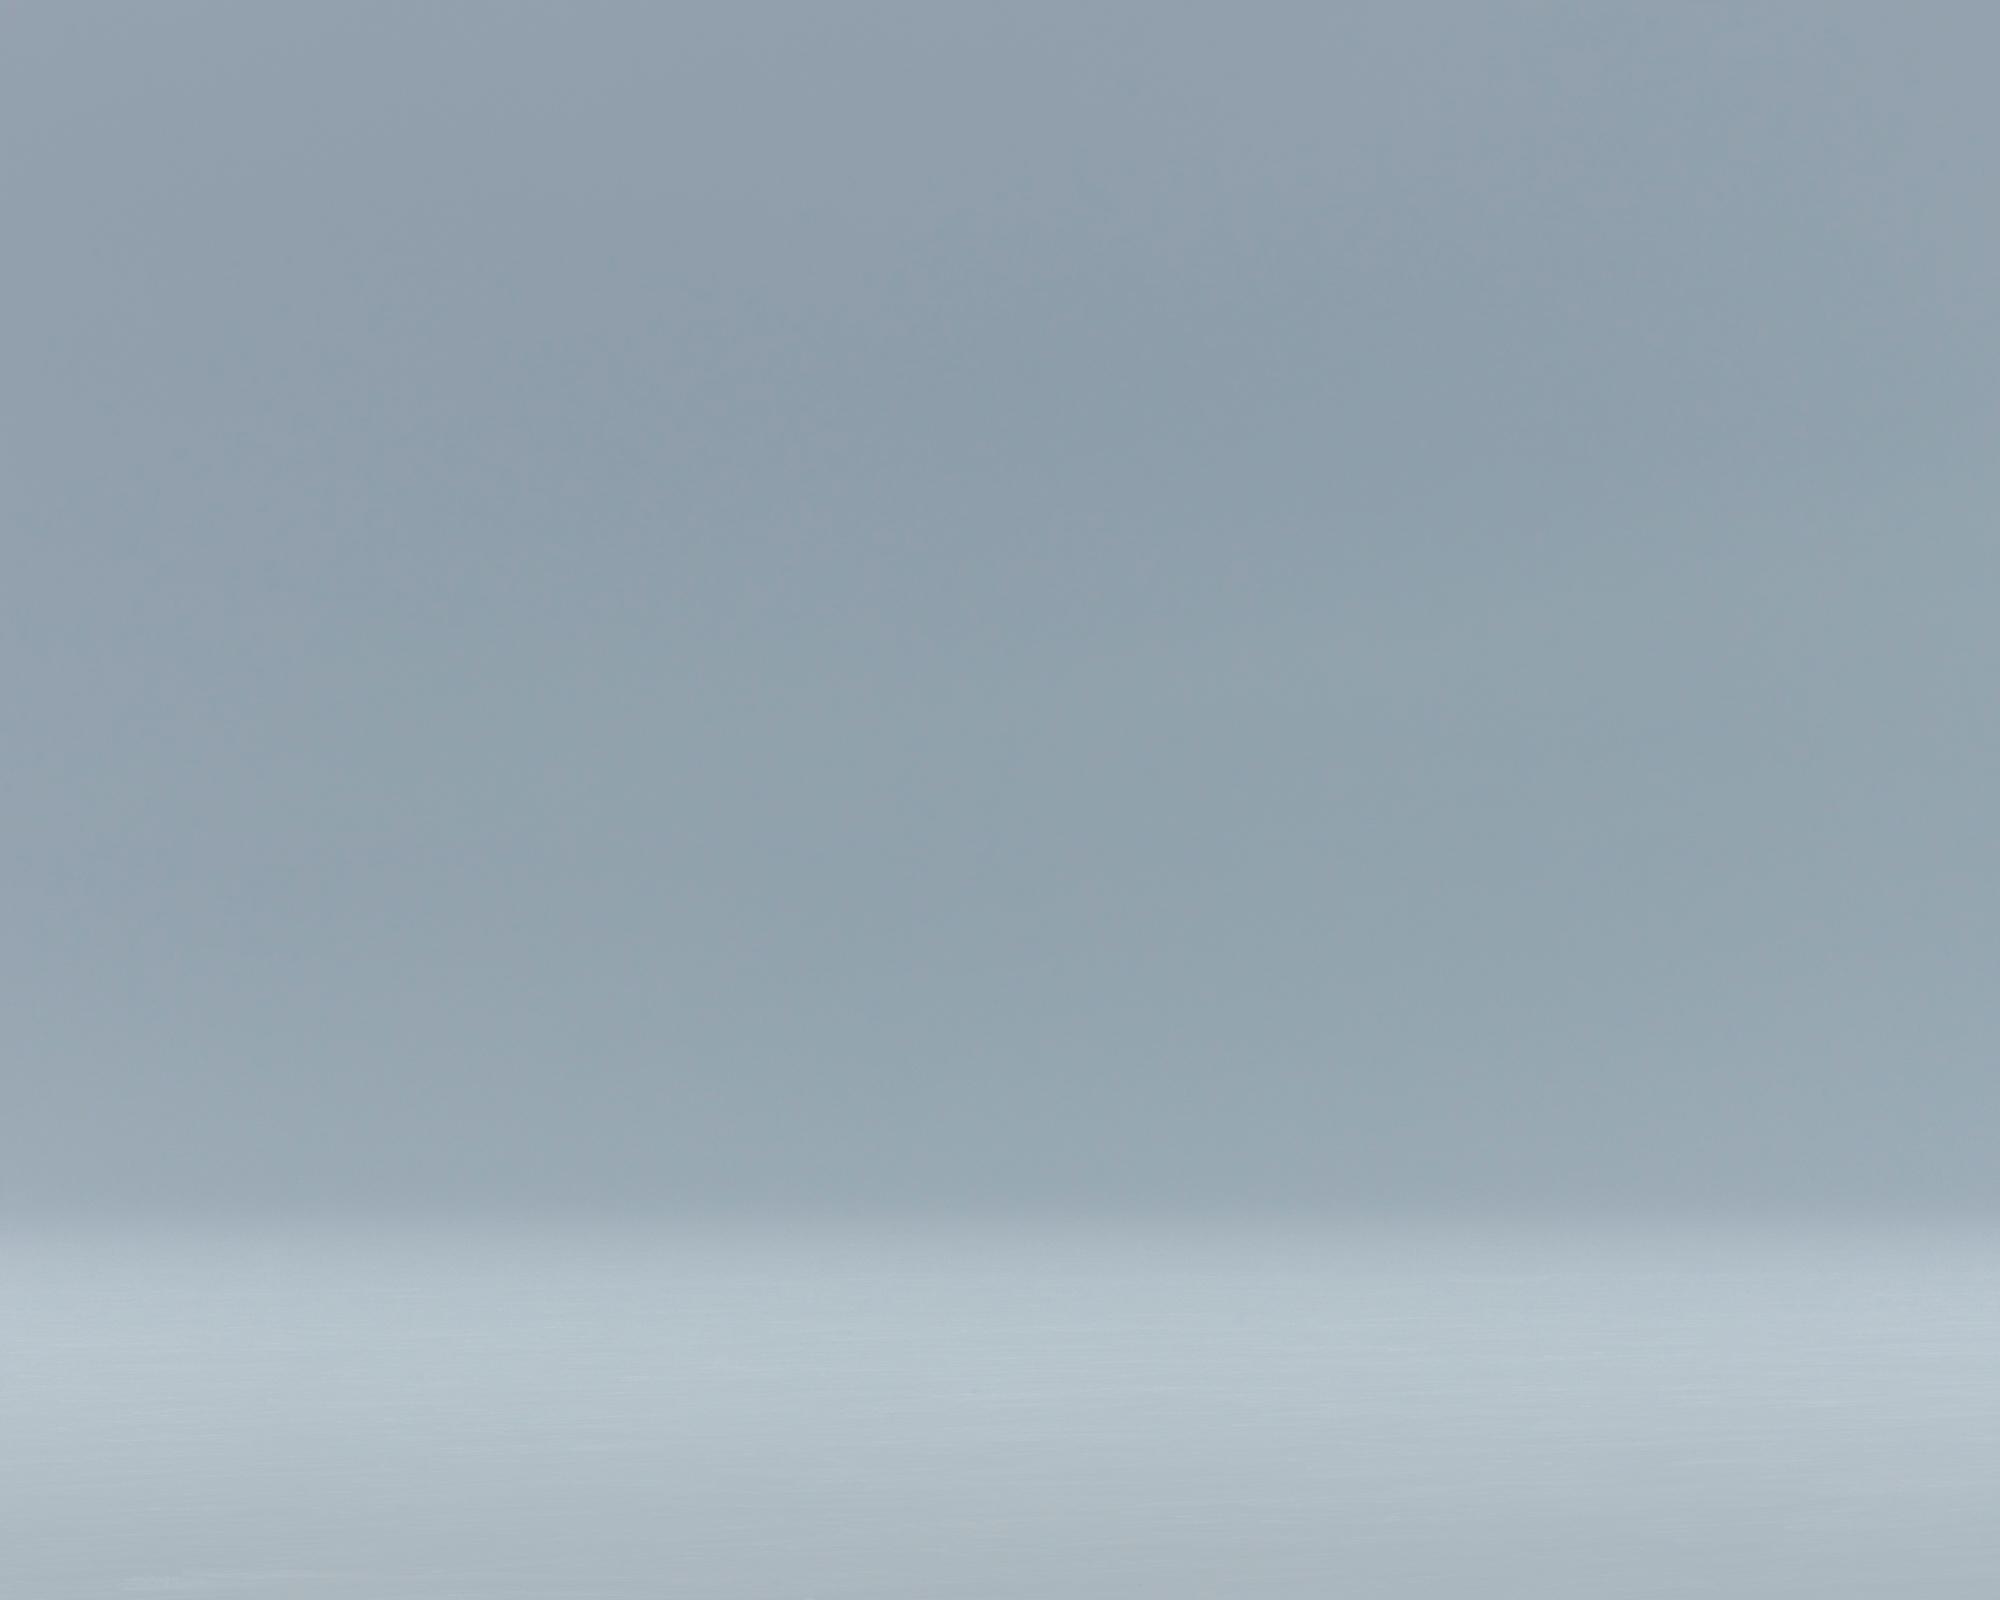 Icesheet #5133, 120cm x 150cm, Digital Pigment Print, Edition of 7, 2013